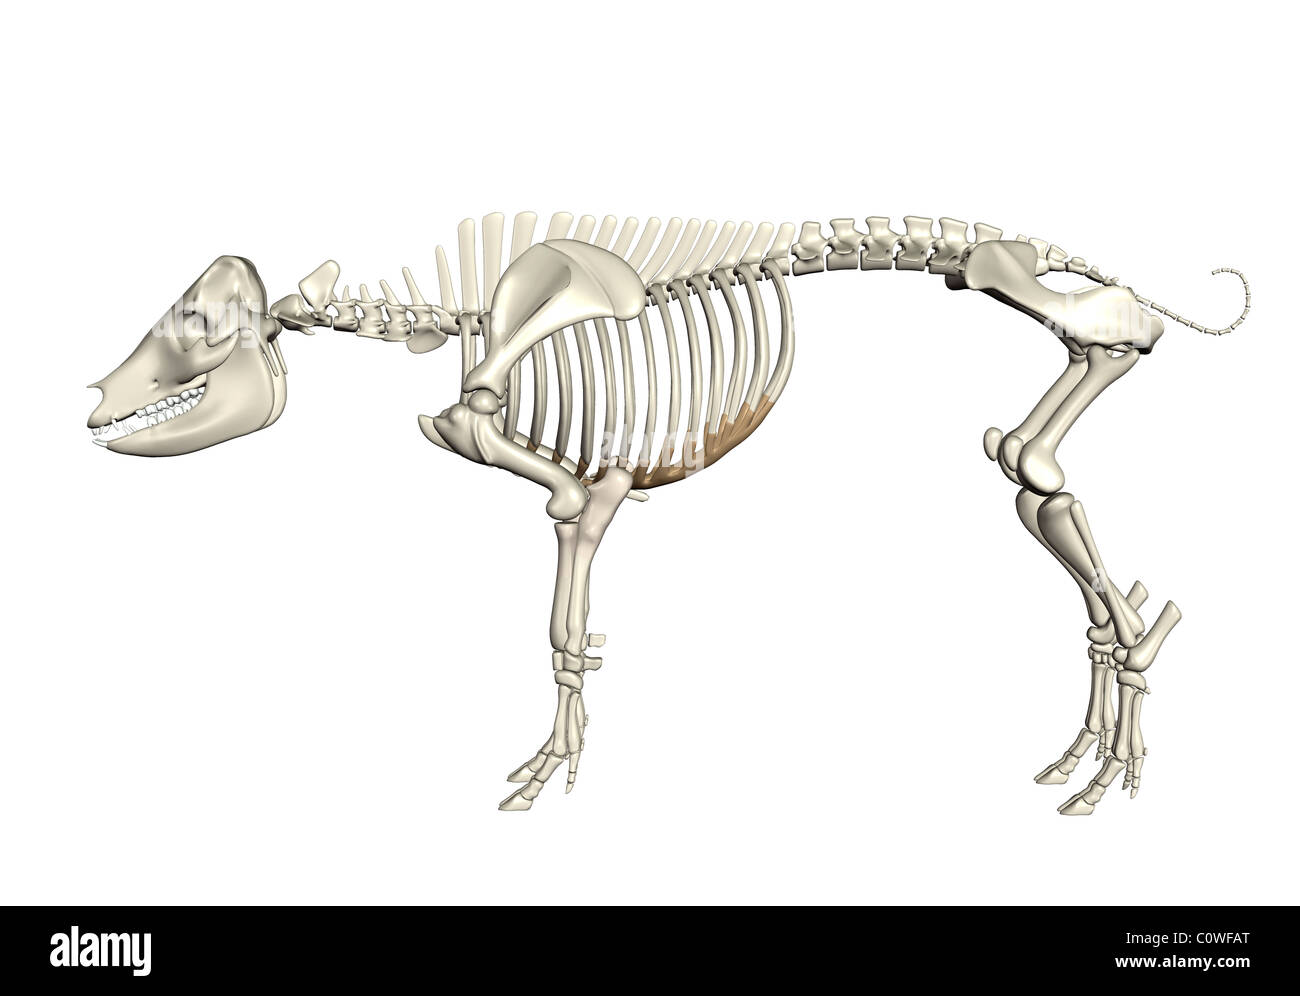 pig anatomy skeleton Stock Photo: 34981600 - Alamy